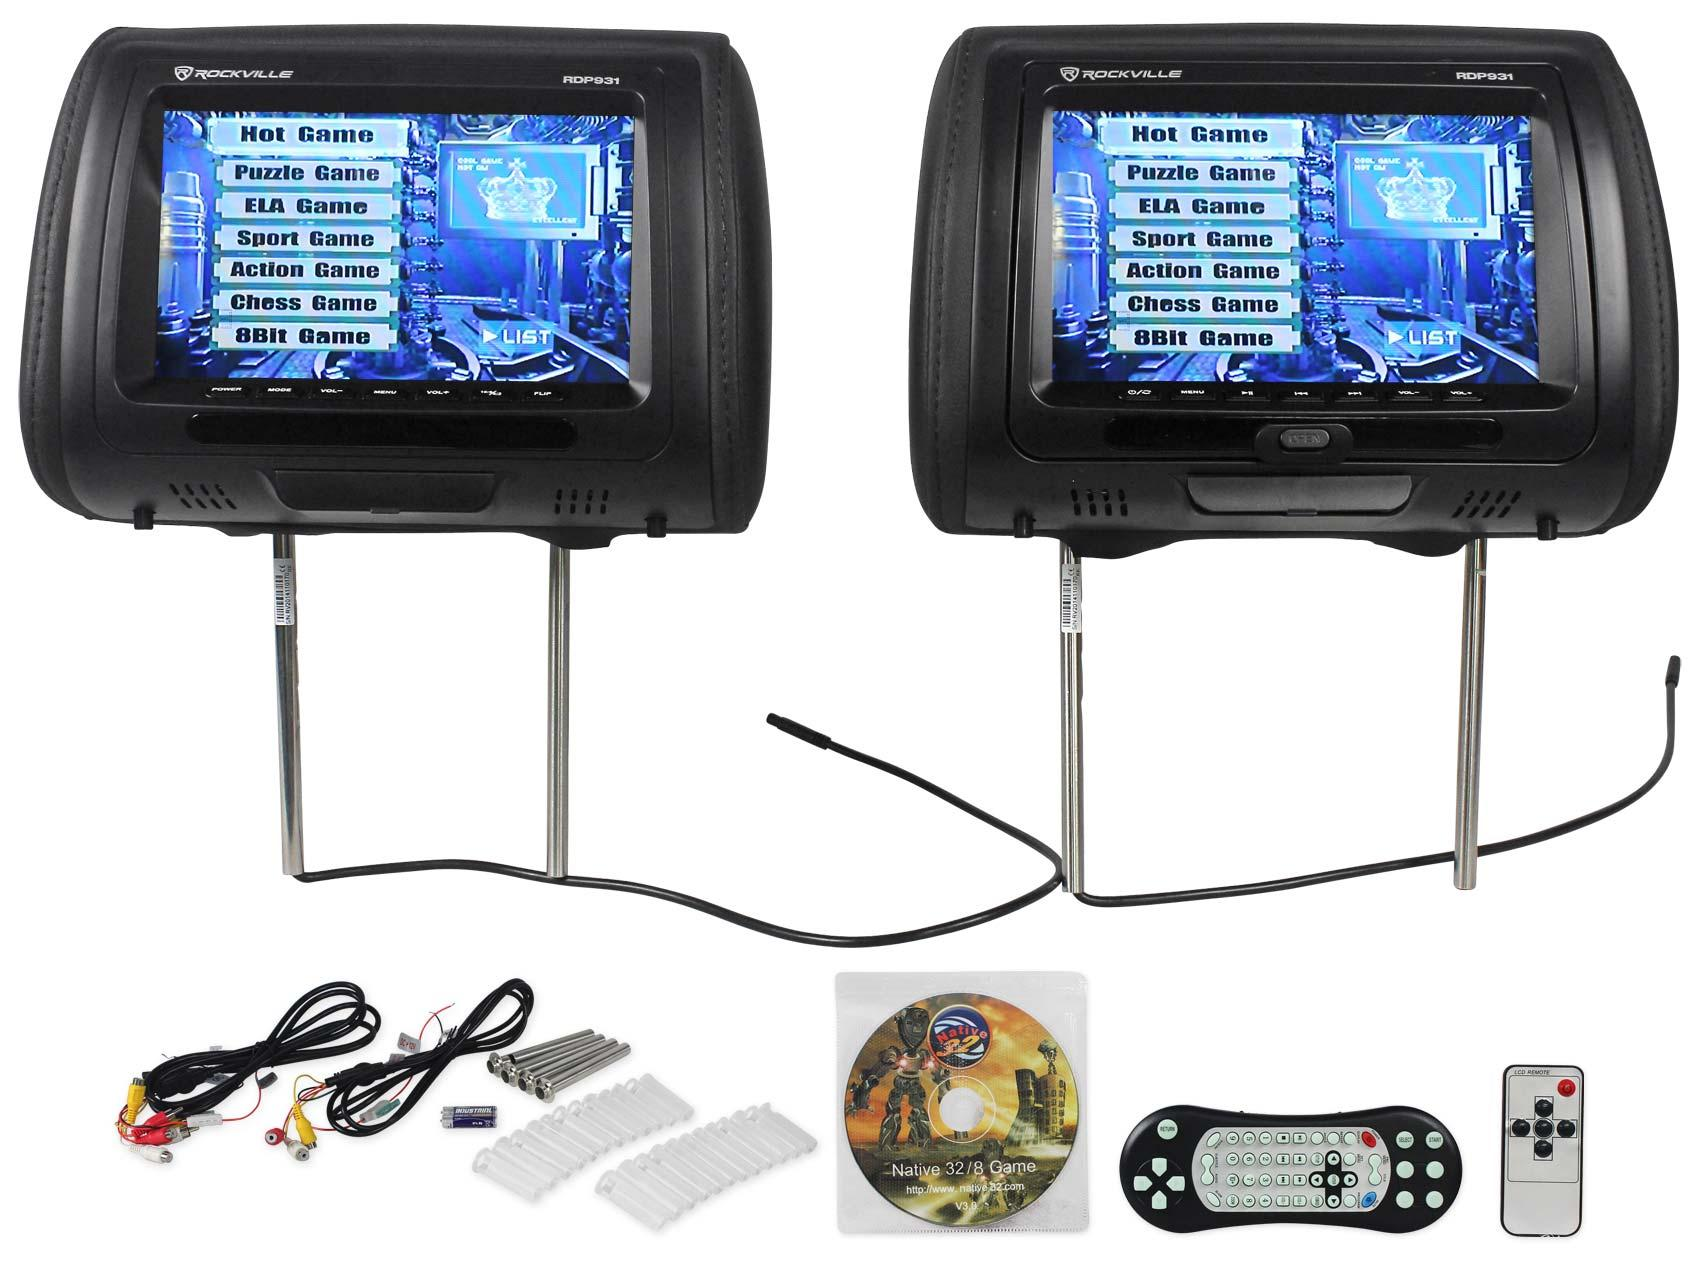 Rockville Rdp931 Bk 9 Black Car Dvd Usb Hdmi Headrest 2002 Chevy Impala Cigarette Lighter Wiring Diagram New Monitors Video Games